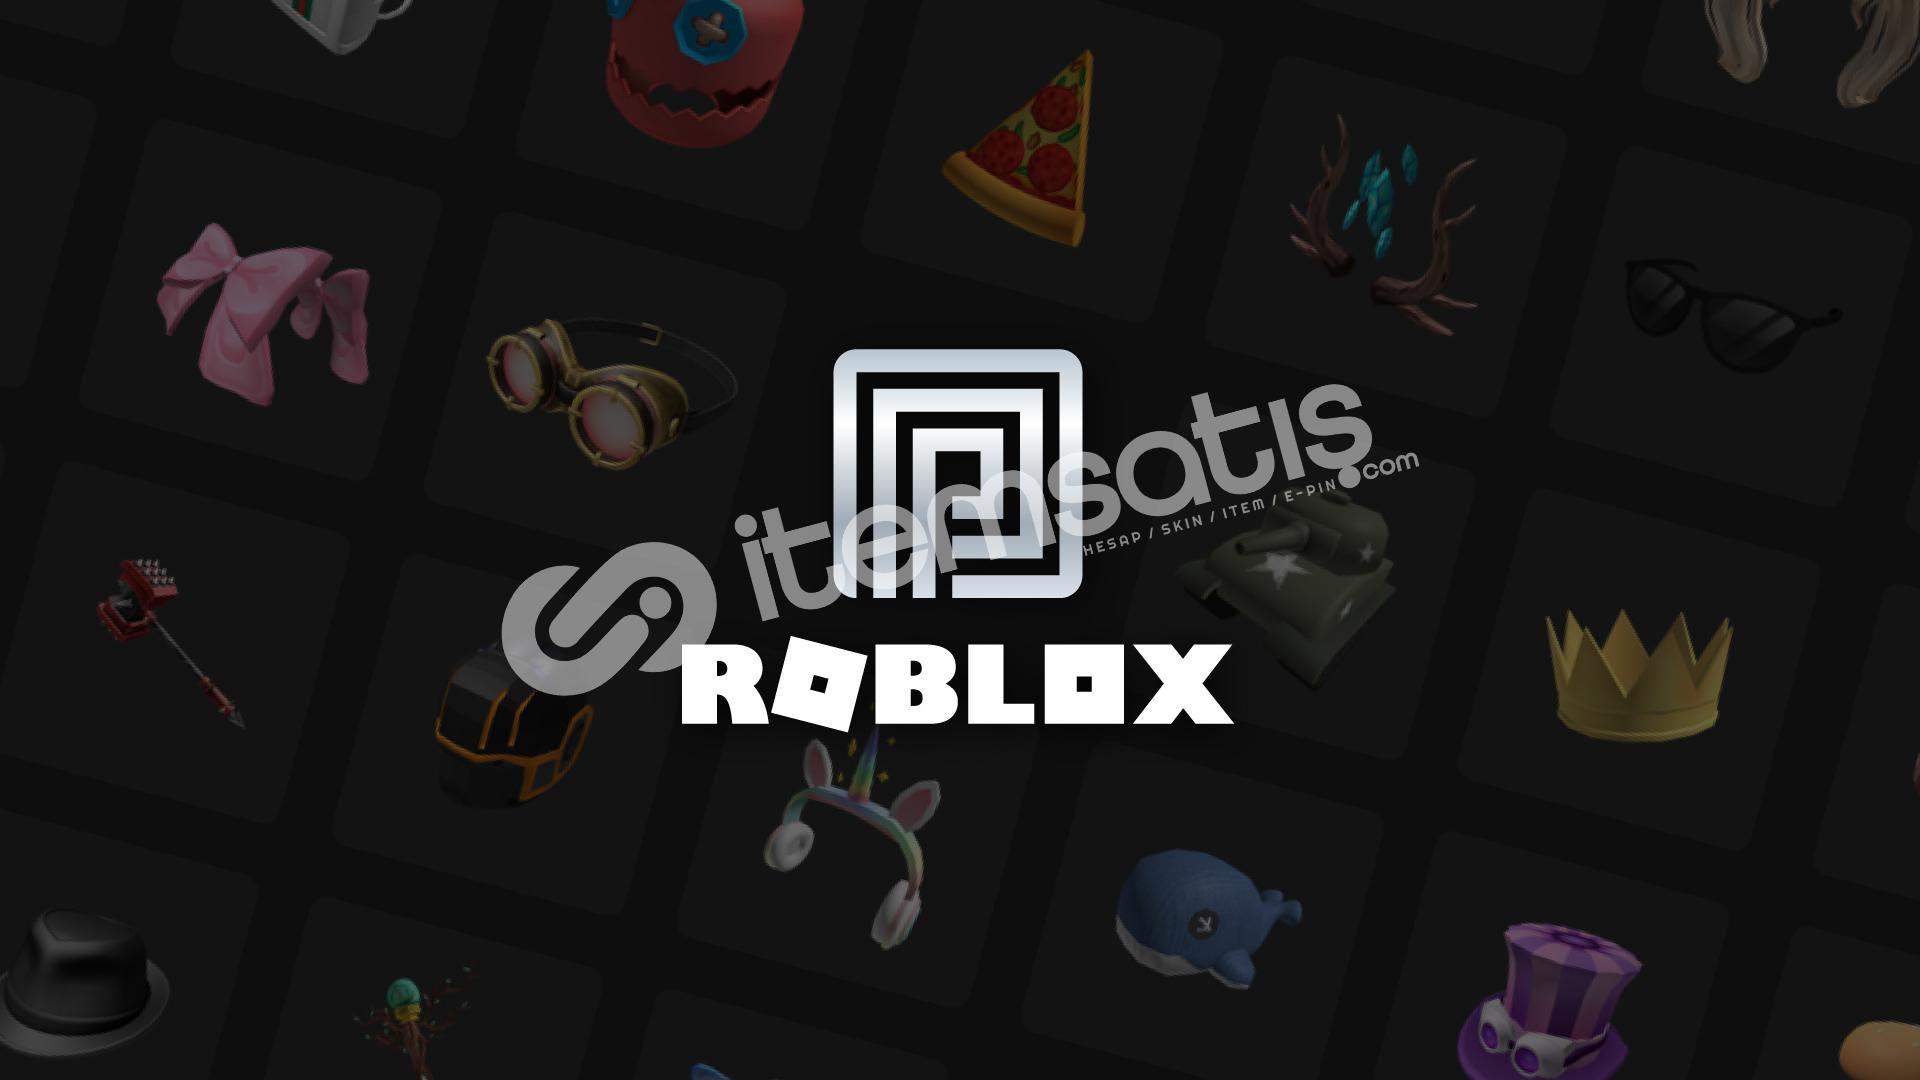 Roblox 2400 Robux (İndirimli)